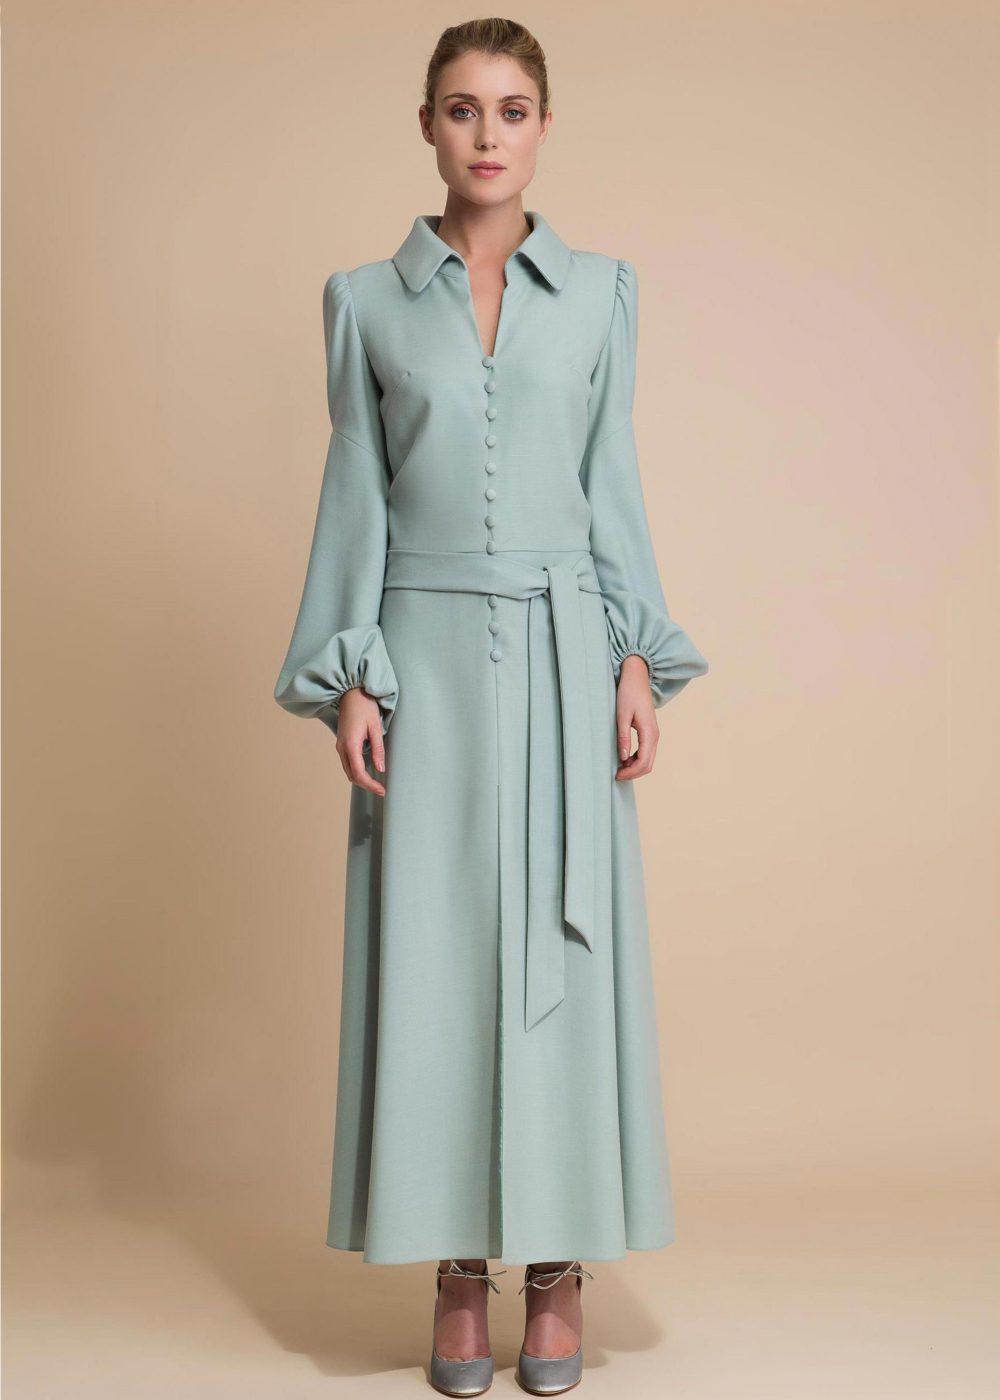 Bill-robe-longue-vintage-bleue1